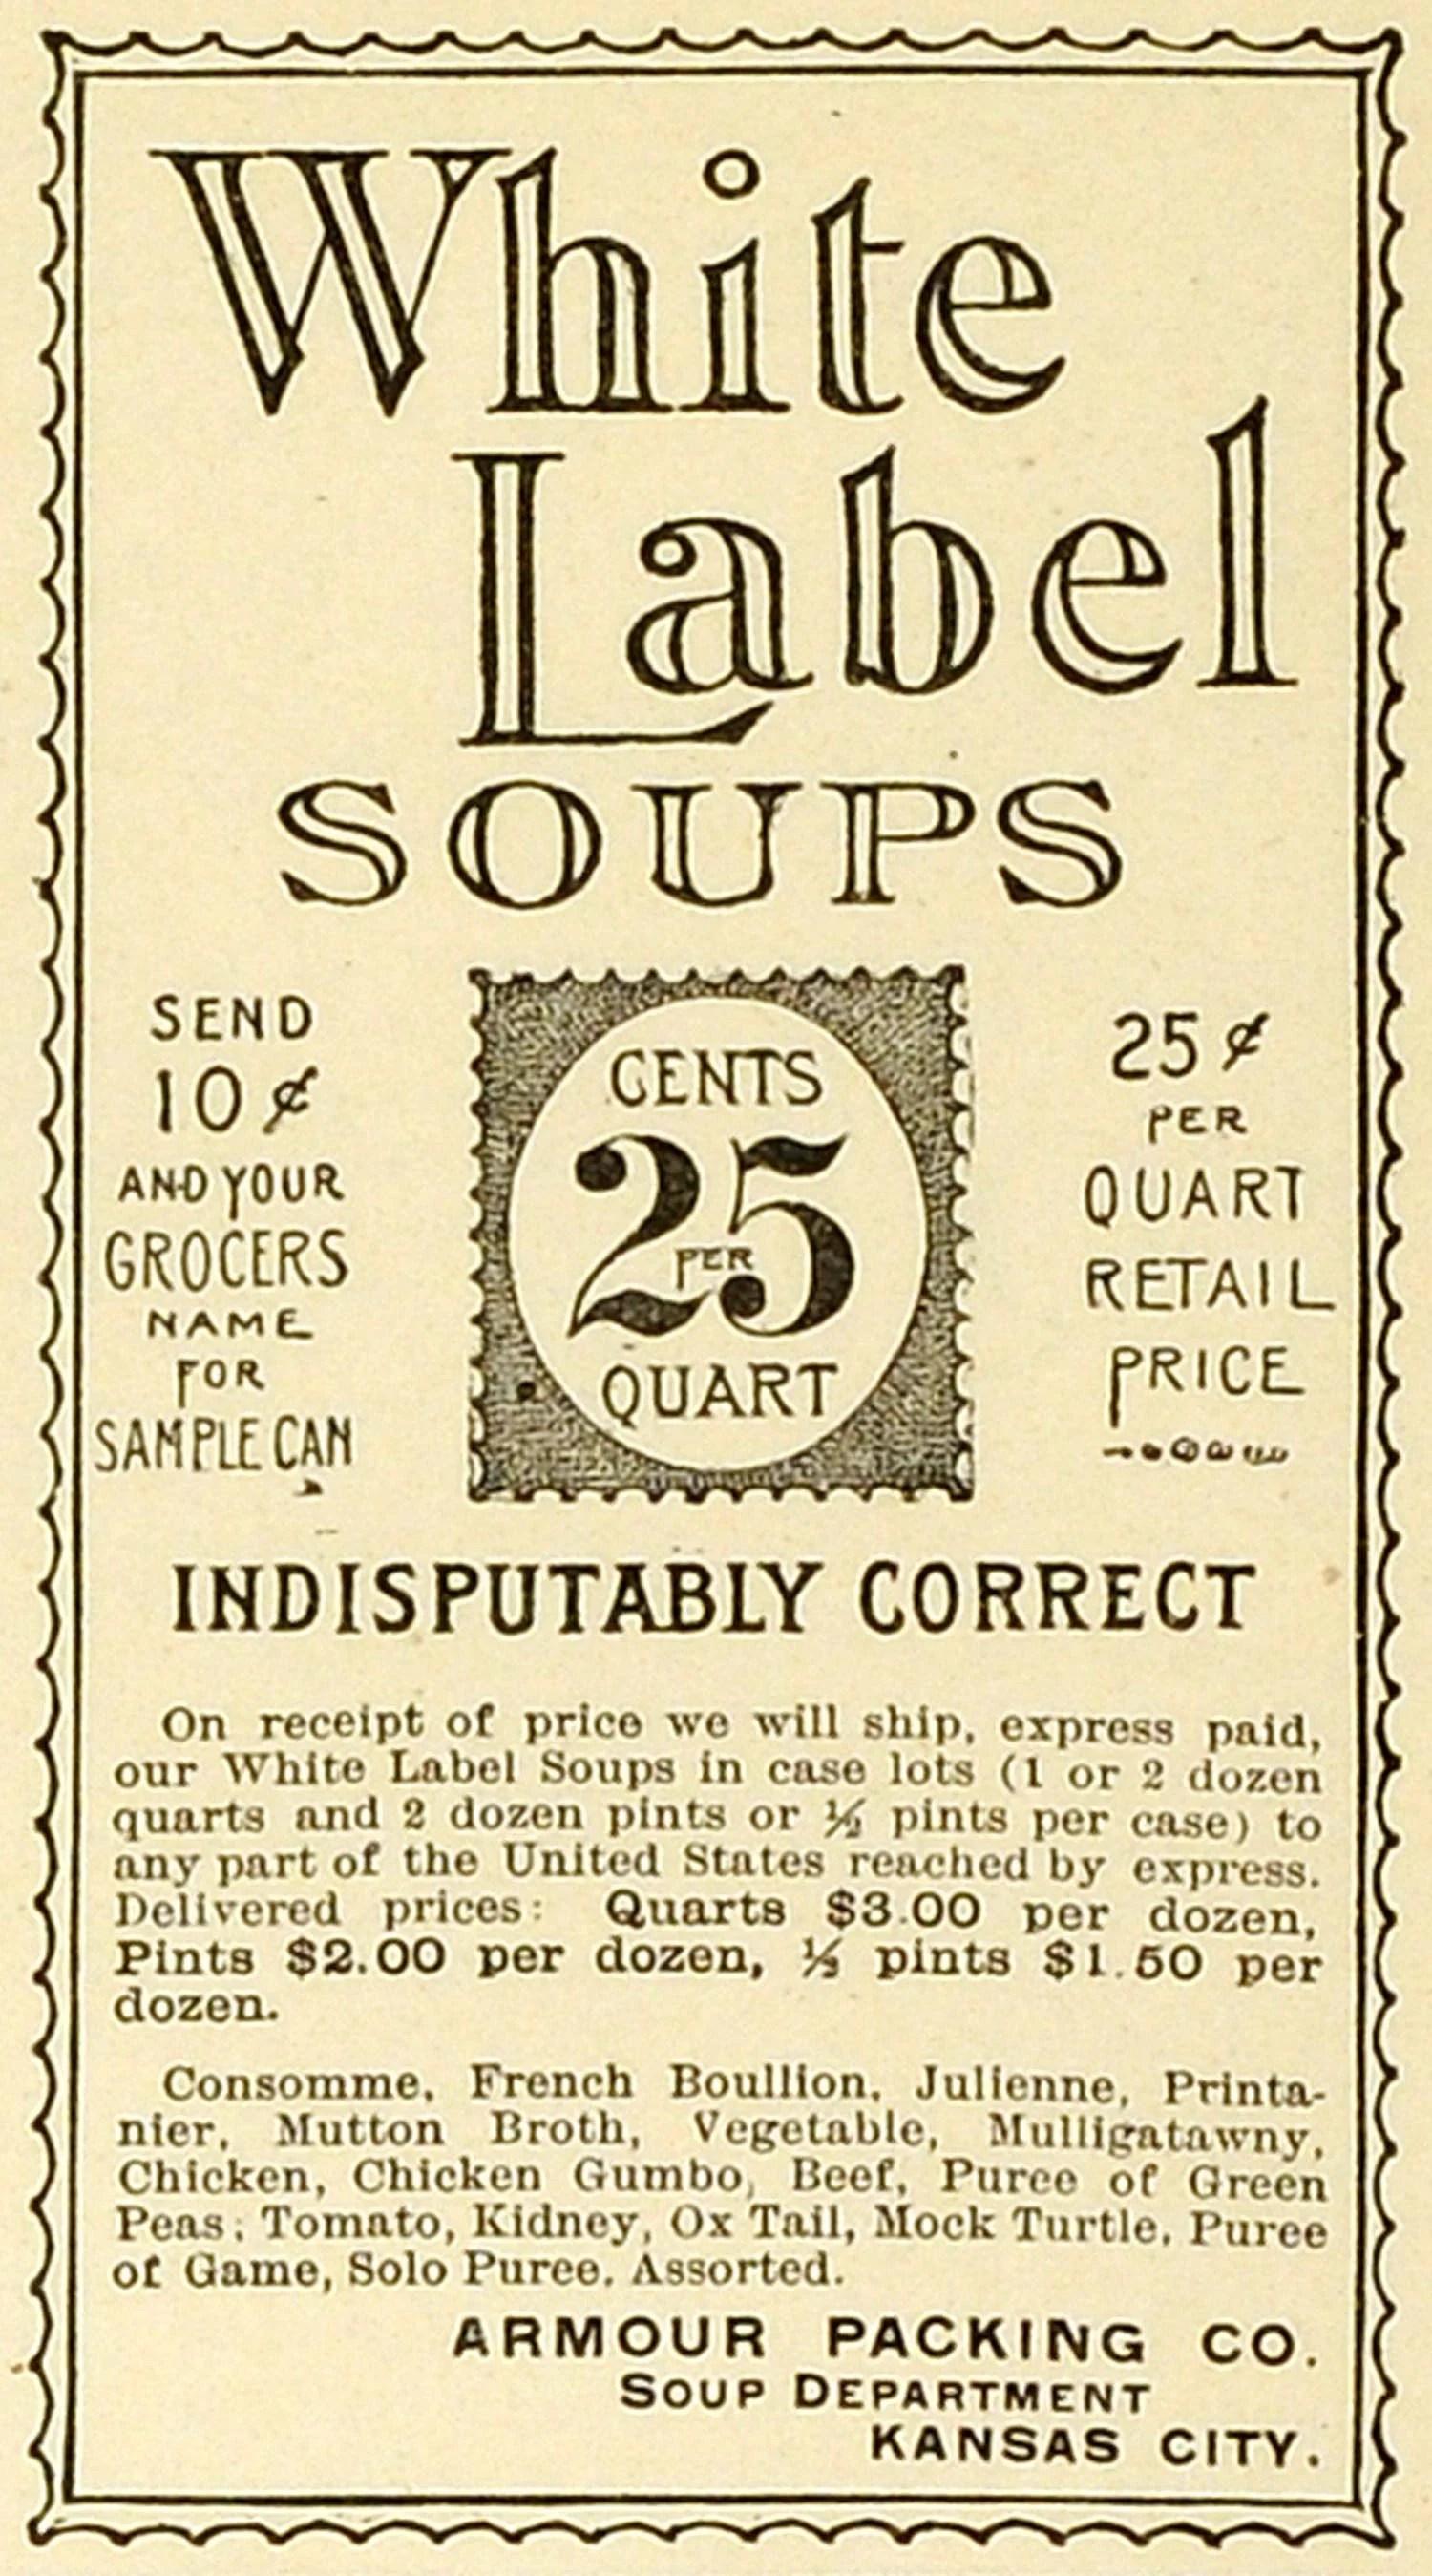 Inspiring Ad Armour Packing Co Kansas Label Soups Consomme Bouillon Ad Armour Packing Co Kansas Label Soups Consomme Bouillon Pints Per Quart Per Gallon 2 Us Pints houzz-02 Pints Per Quart